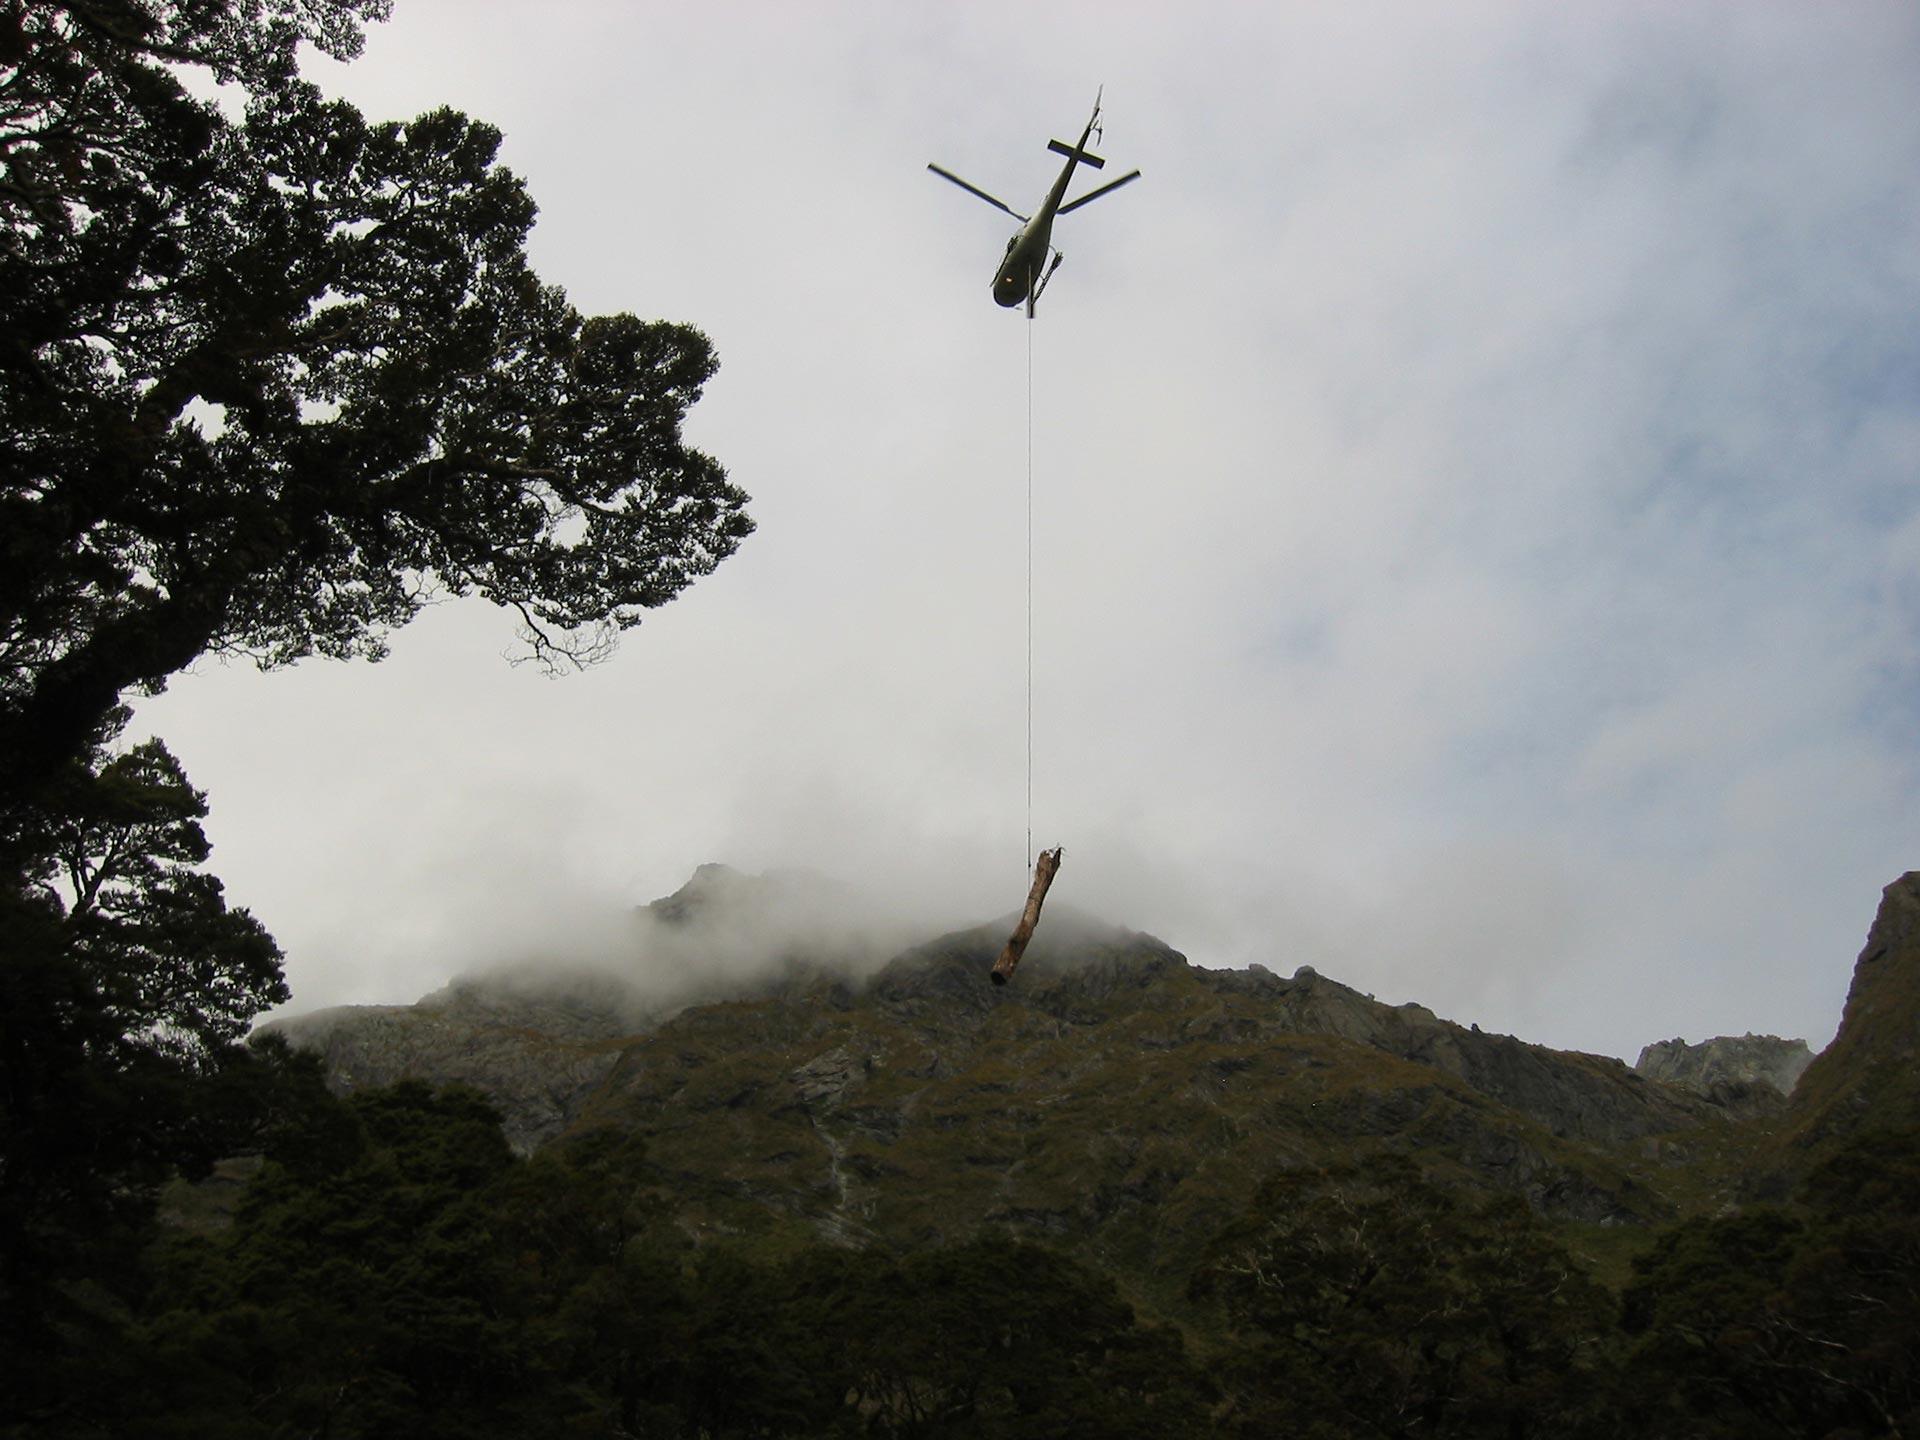 Tree removal - Lake McKenzie, Routeburn Track, Fiordland, New Zealand